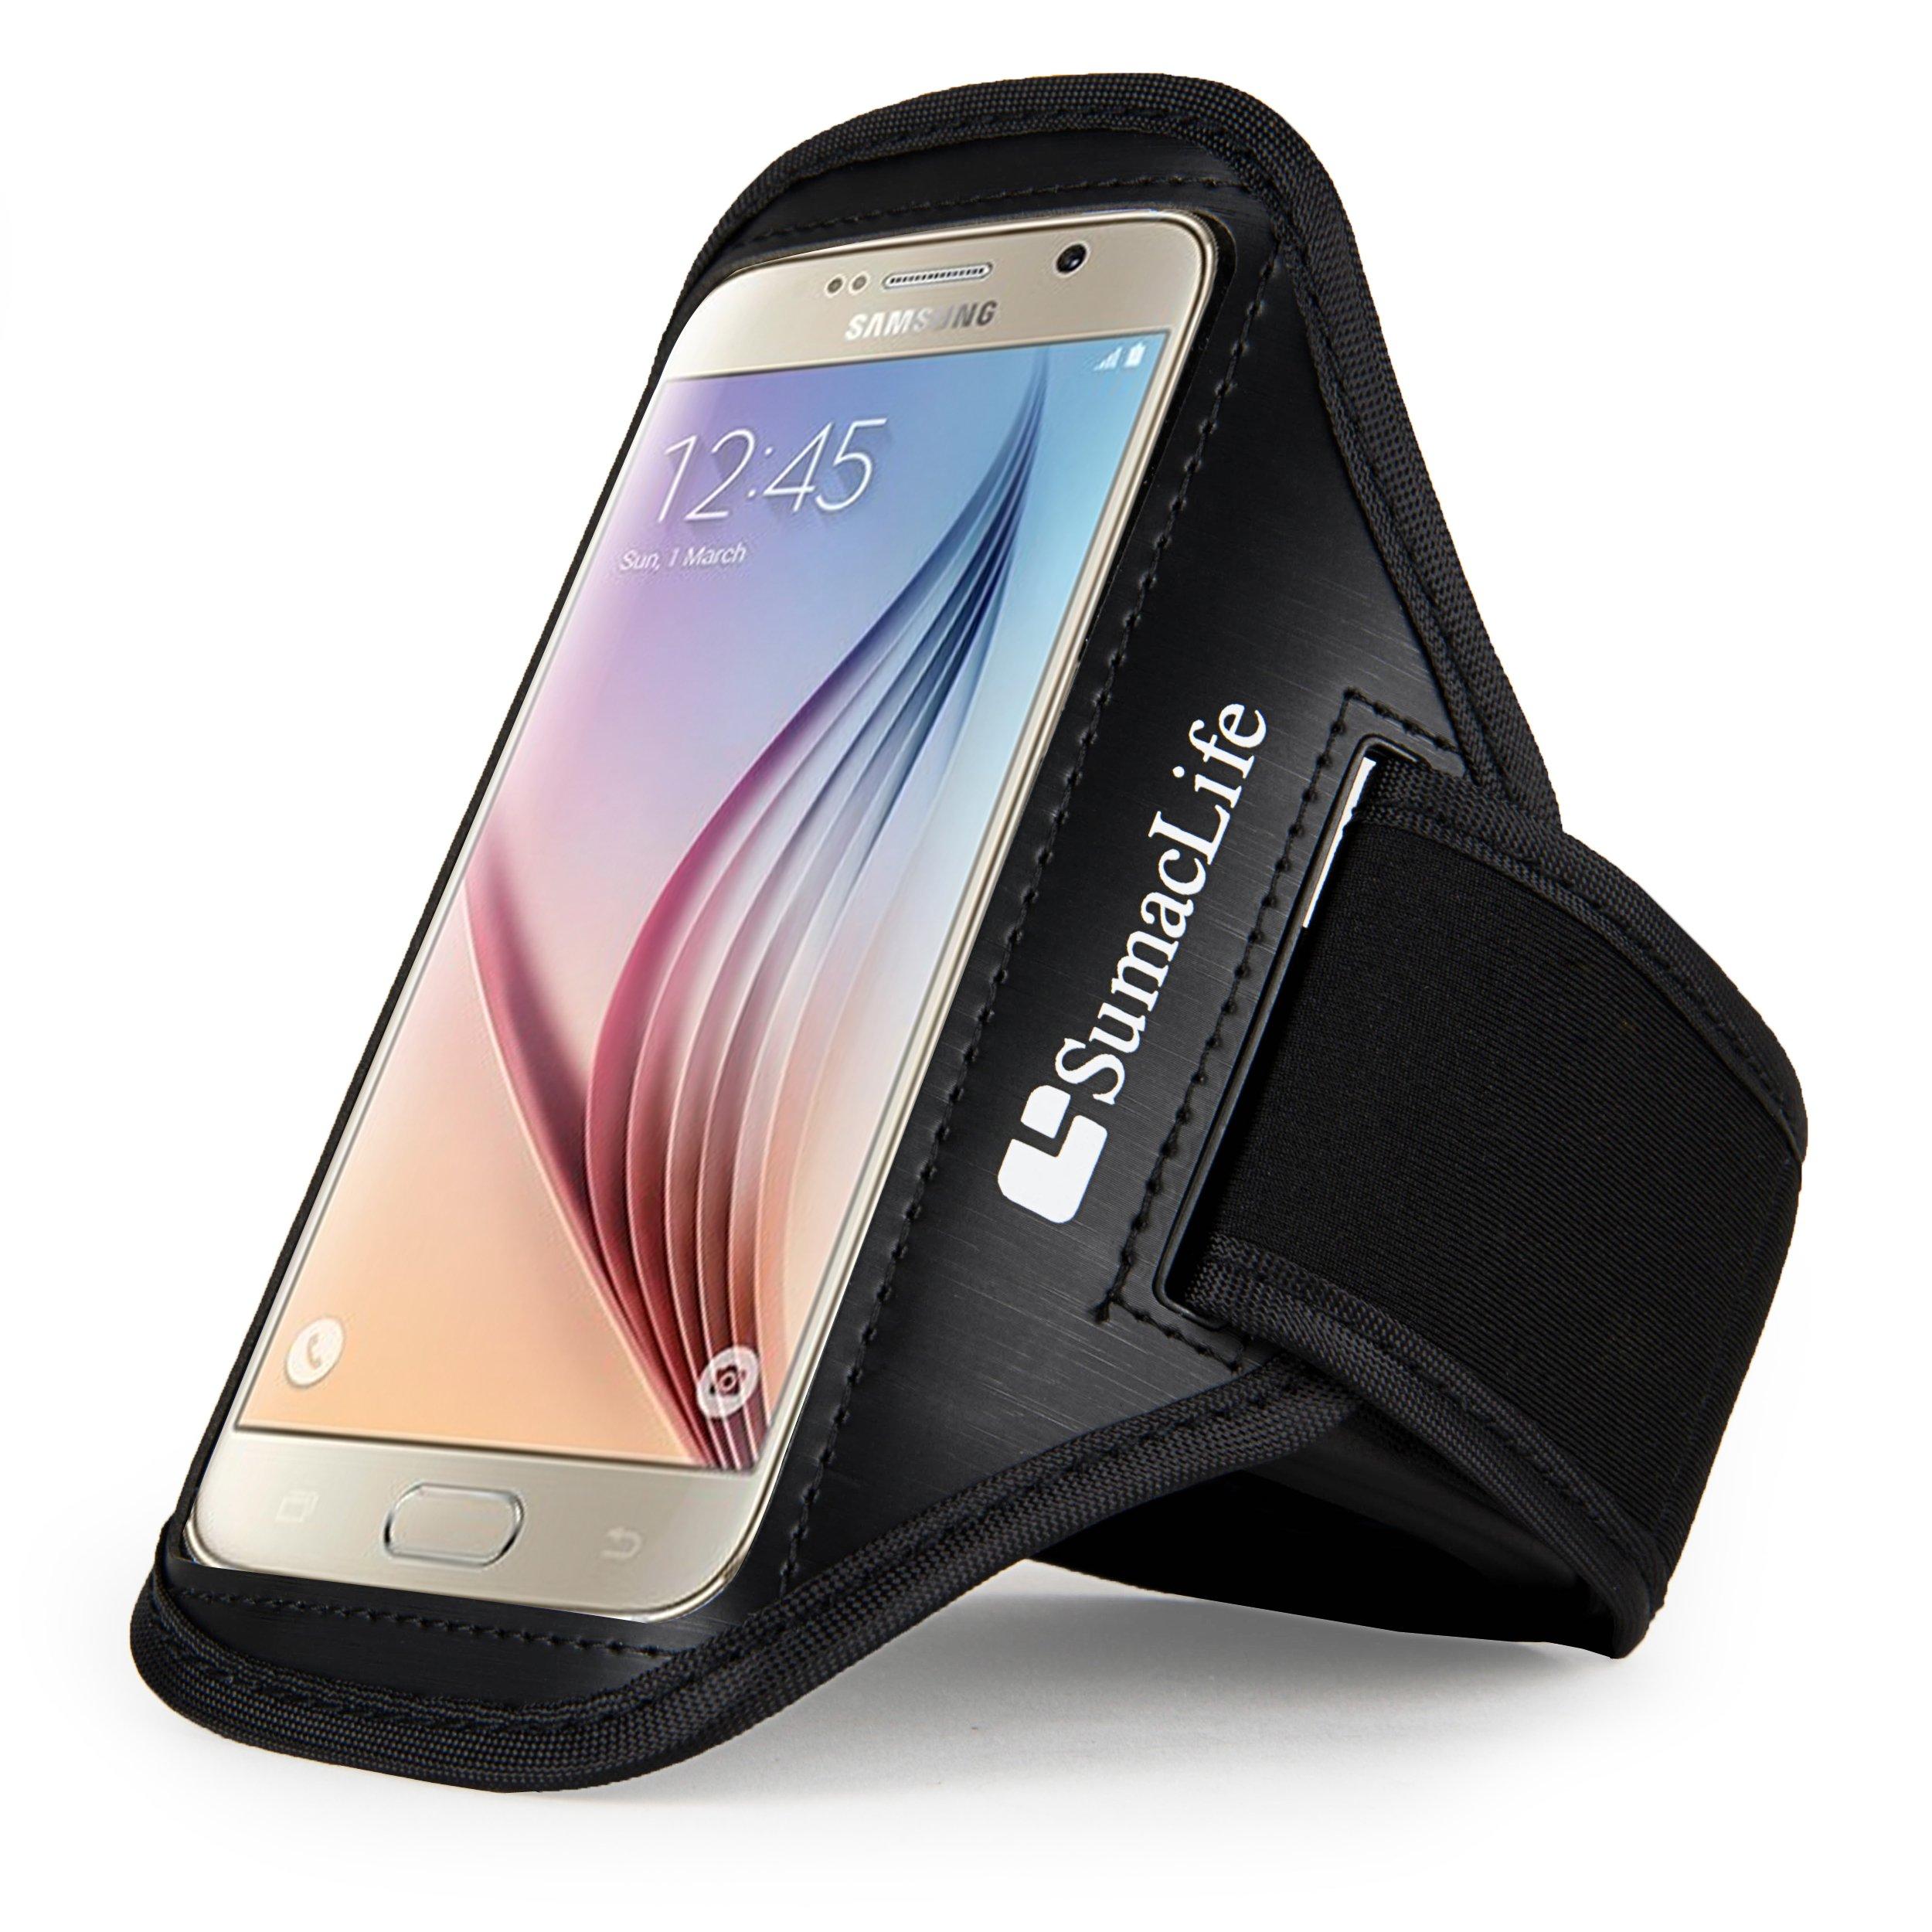 Sumaclife Fashion Sports Series Cellphone Armband Armlet for Samsung Galaxy S6 Edge Plus/ Note5/ Note Edge/ Sony Xperia Z3/ Microsoft Lumia 640 XL/ LG G4/ G Vista/ G Stylo/ G Vista (Black)